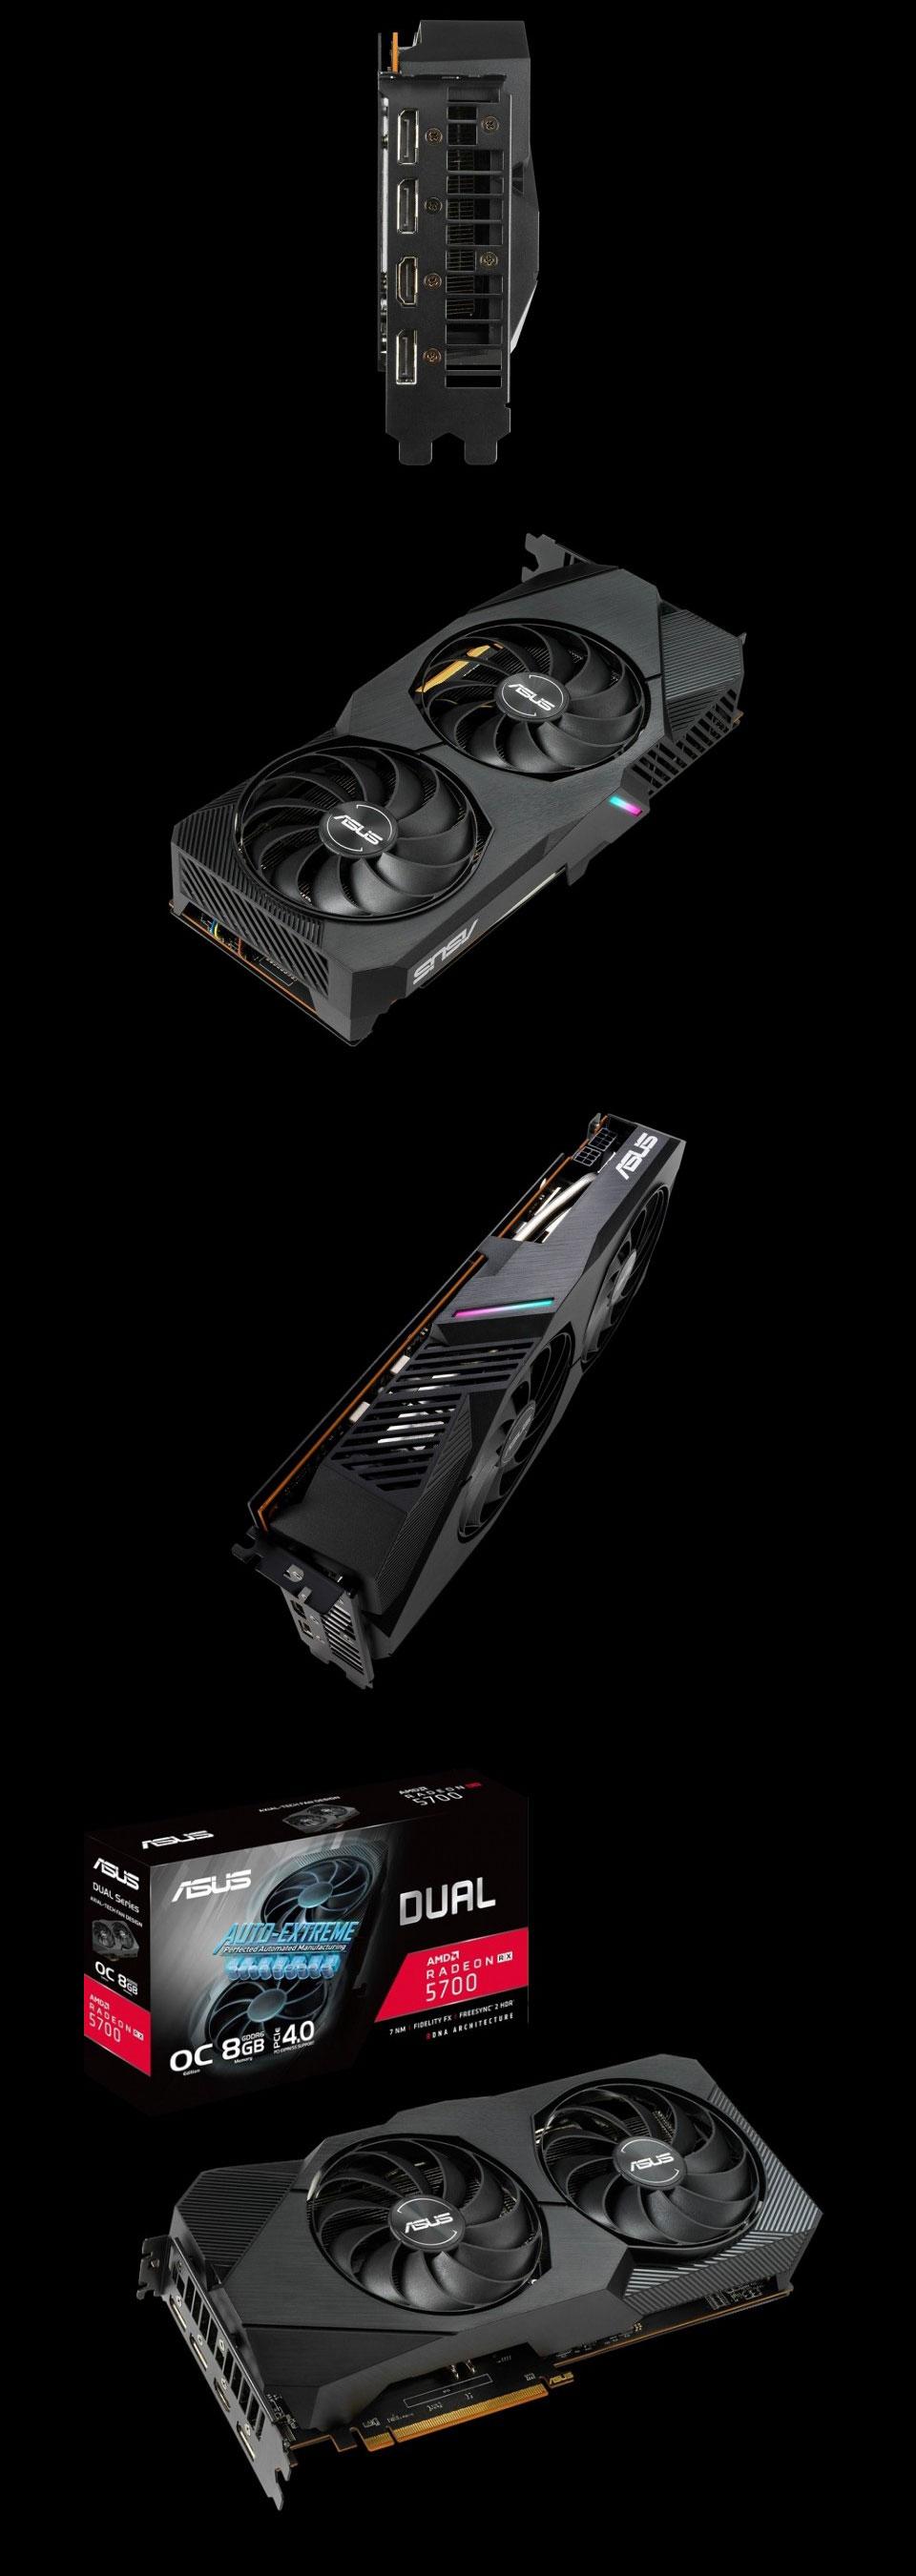 ASUS Radeon RX 5700 Dual EVO OC 8GB product